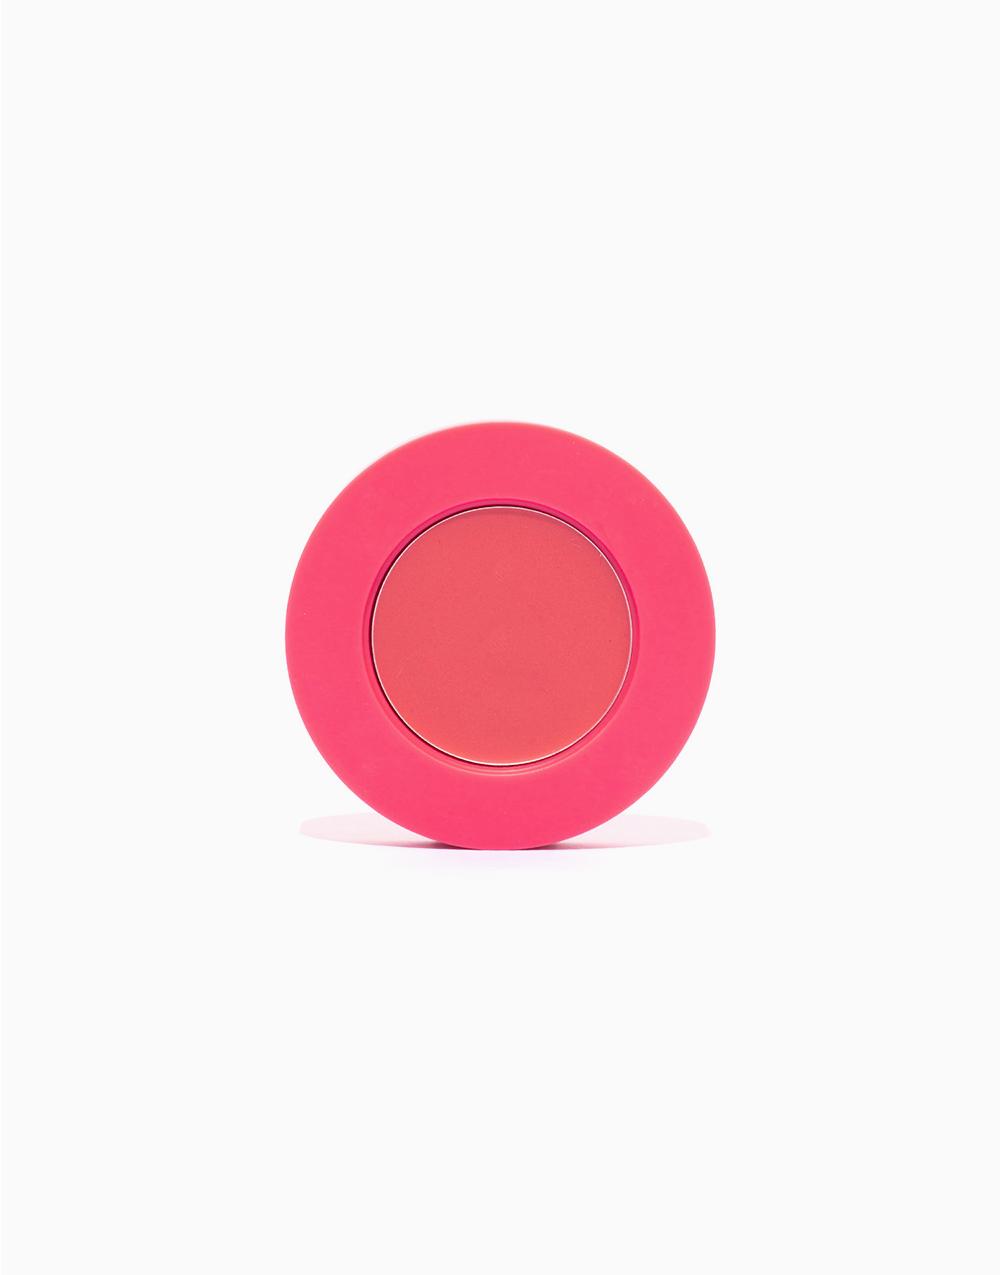 Face Stack Multi Pot Single Pan by BLK Cosmetics | Wanderlust